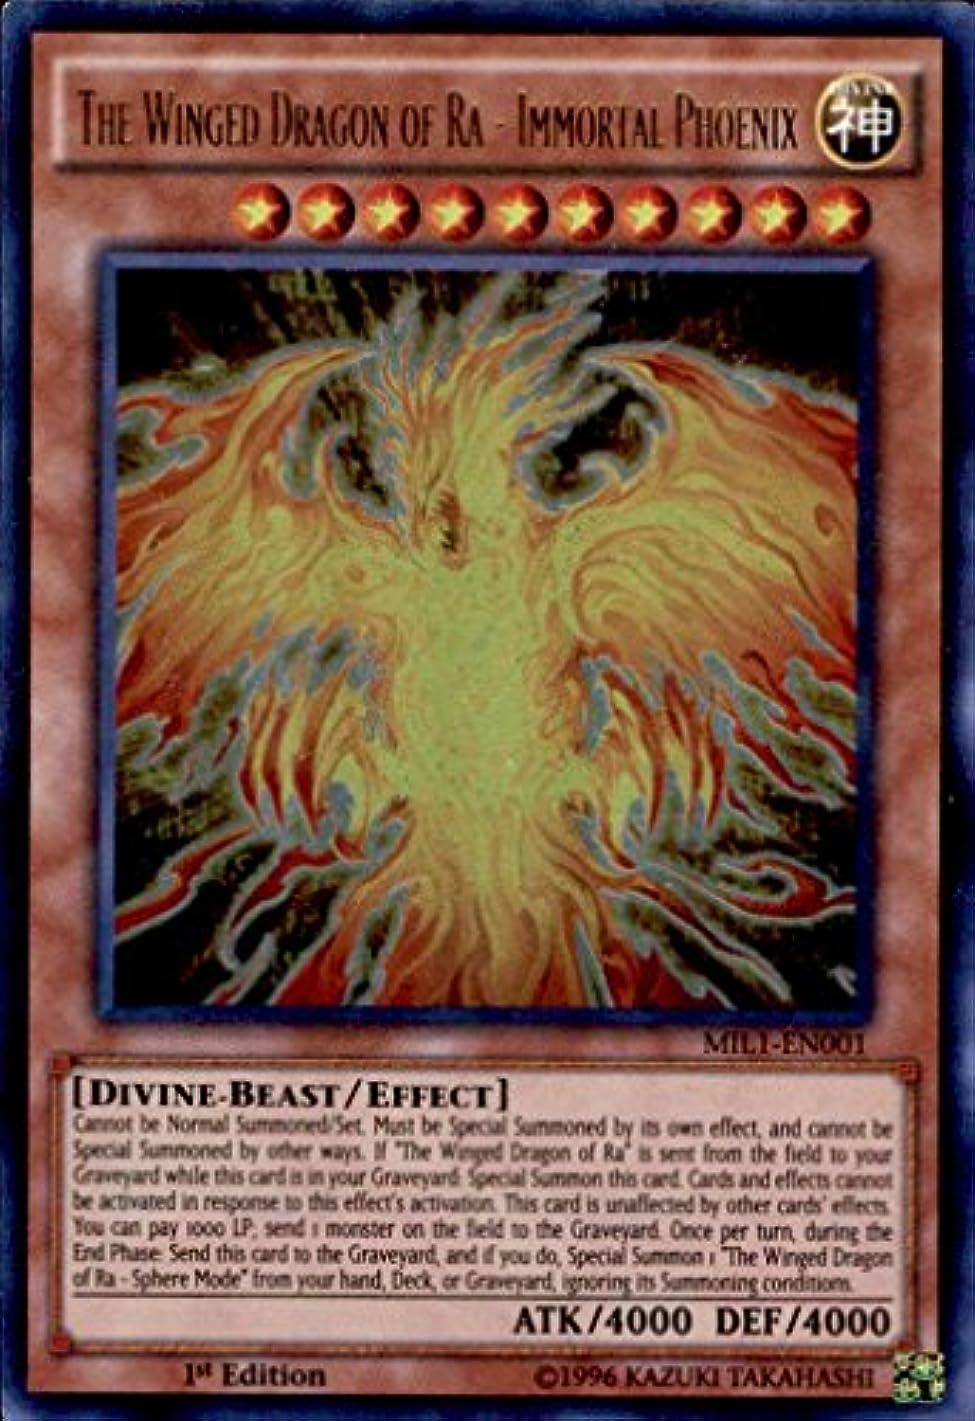 Yu-Gi-Oh! - The Winged Dragon of Ra - Immortal Phoenix MIL1-EN001 Ultra Rare 1st Edition